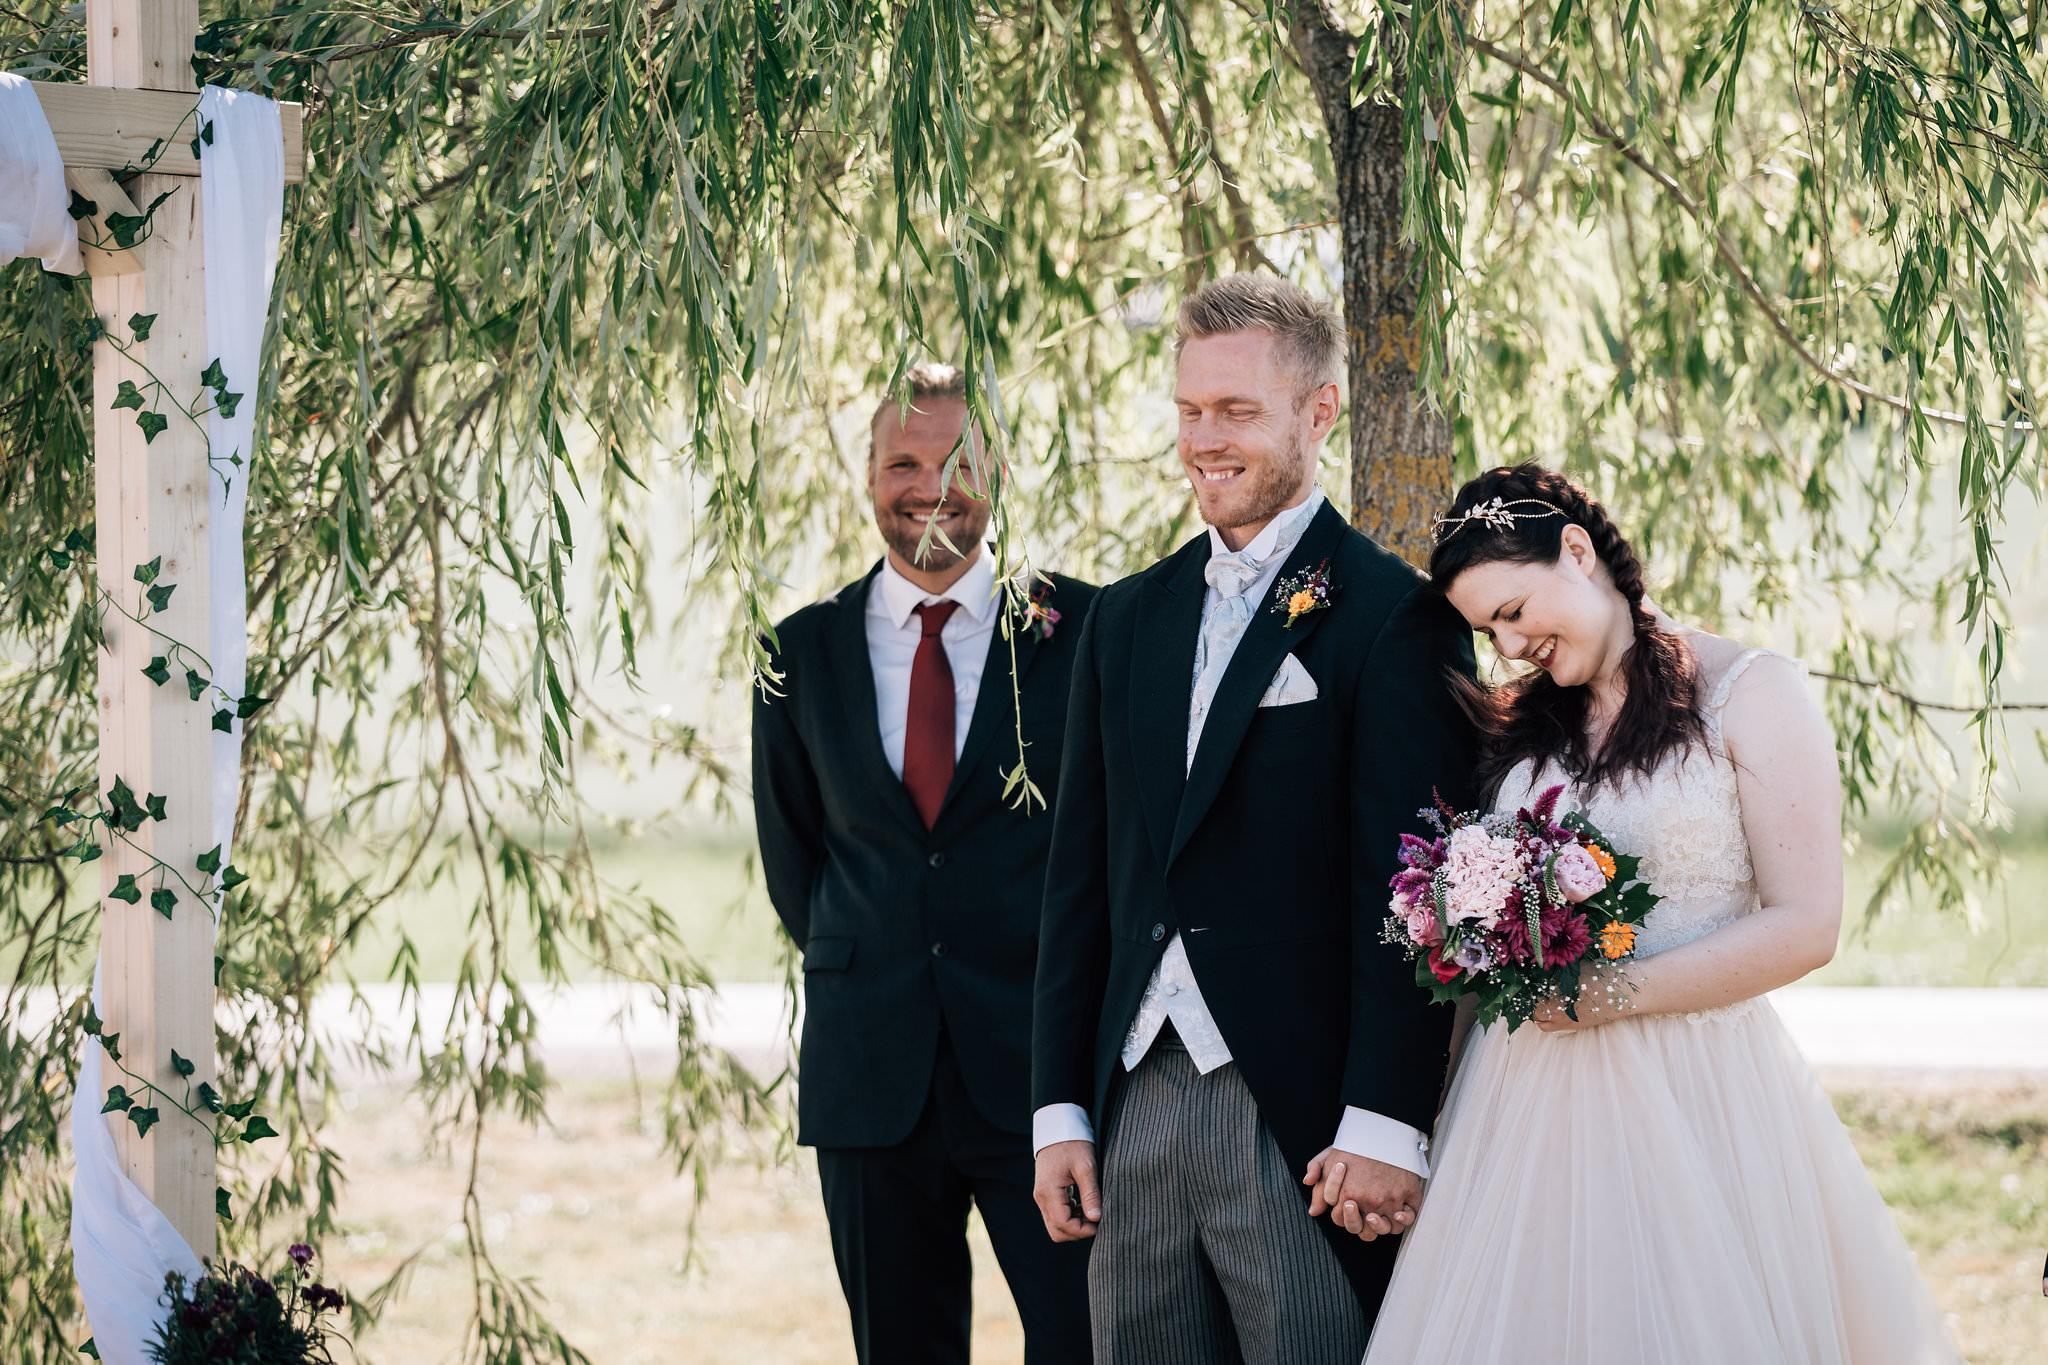 _N850199-fotograf-vestfold-bryllupsfotograf-.jpg